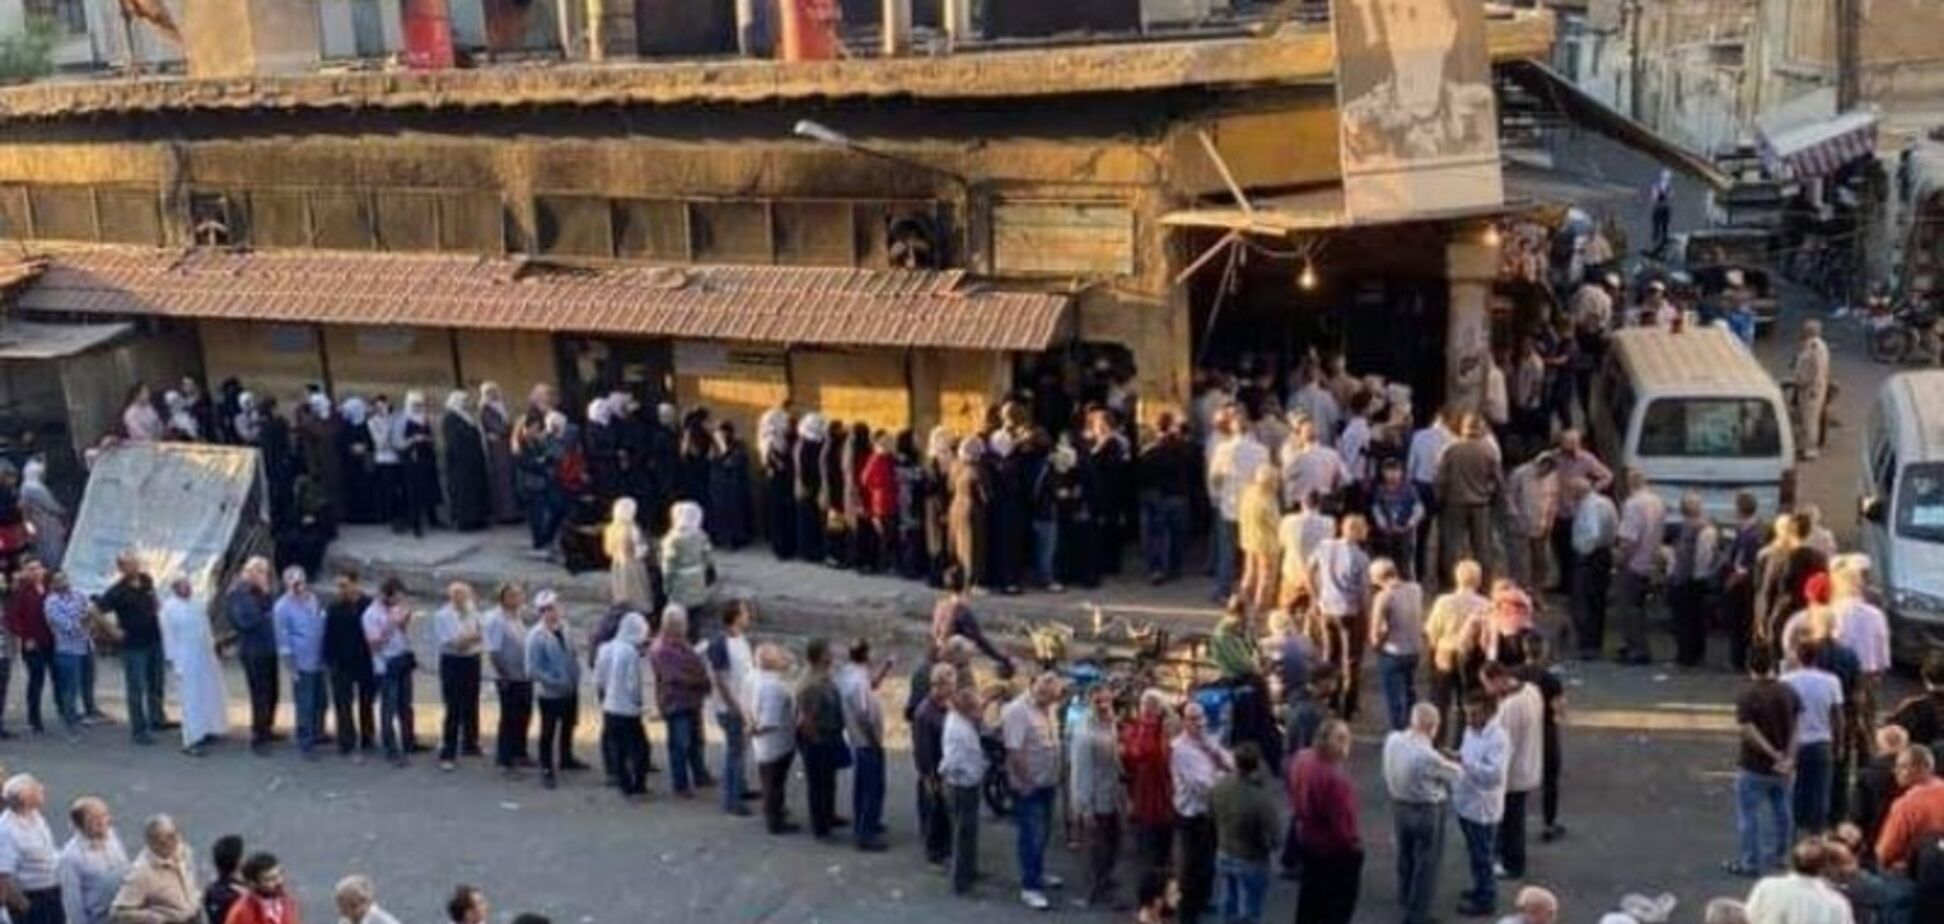 Хлебная катастрофа в Сирии: Путин виновен так же, как и диктатор Башар Асад